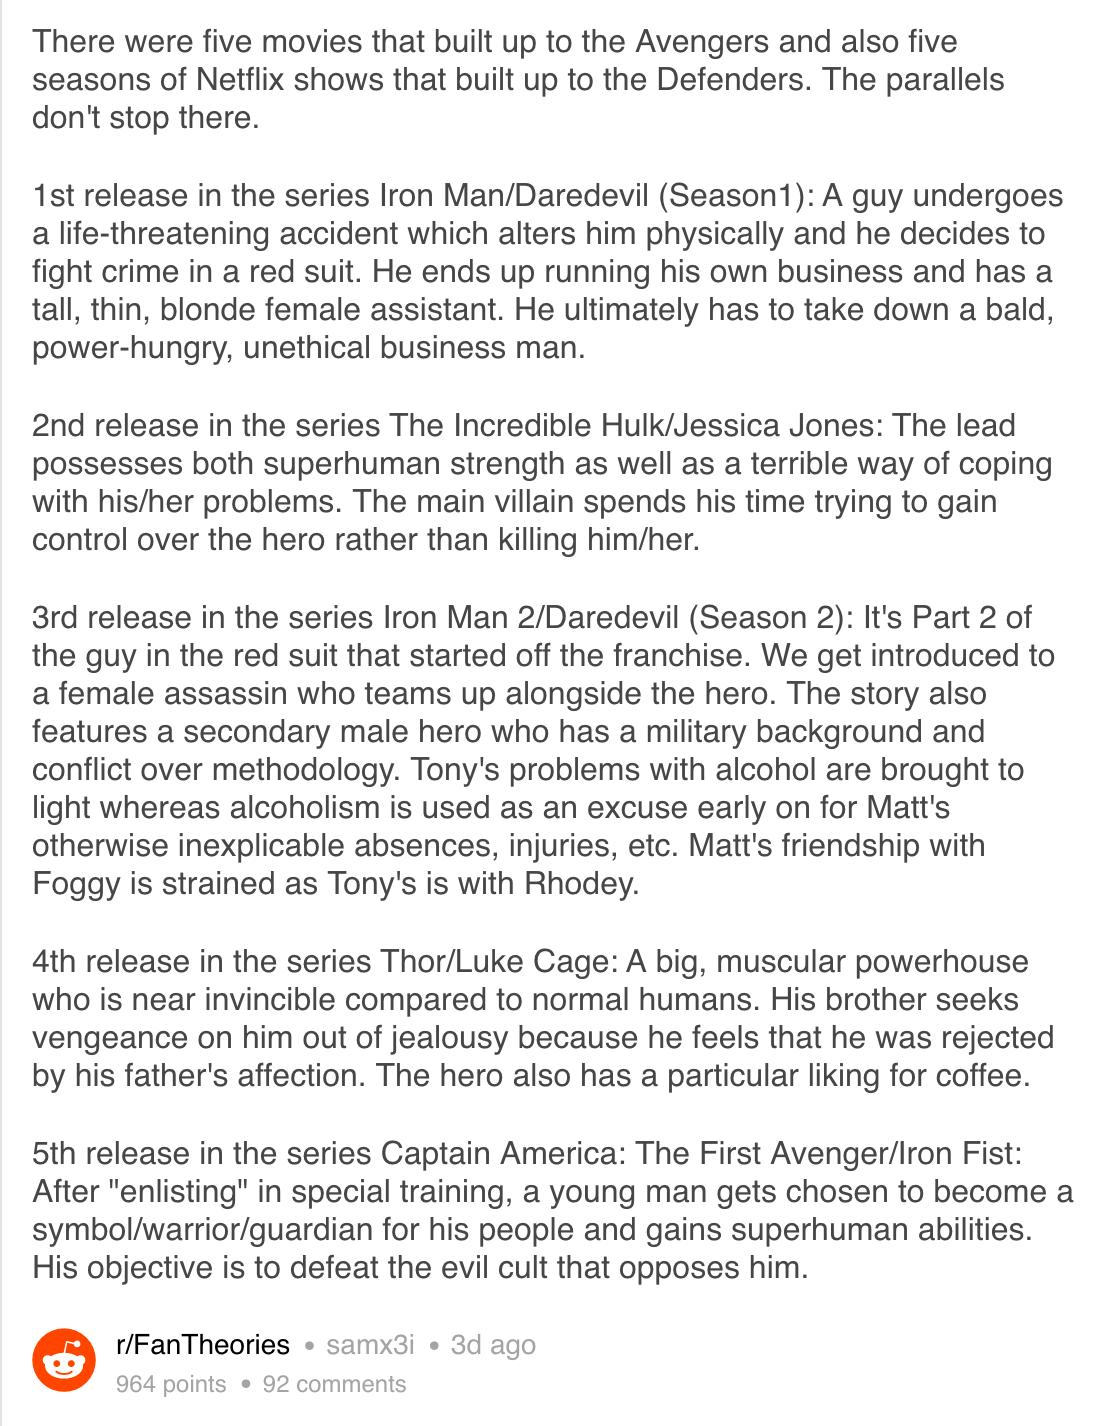 Do Marvels Netflix superhero series share a secret symmetry with the main movies?